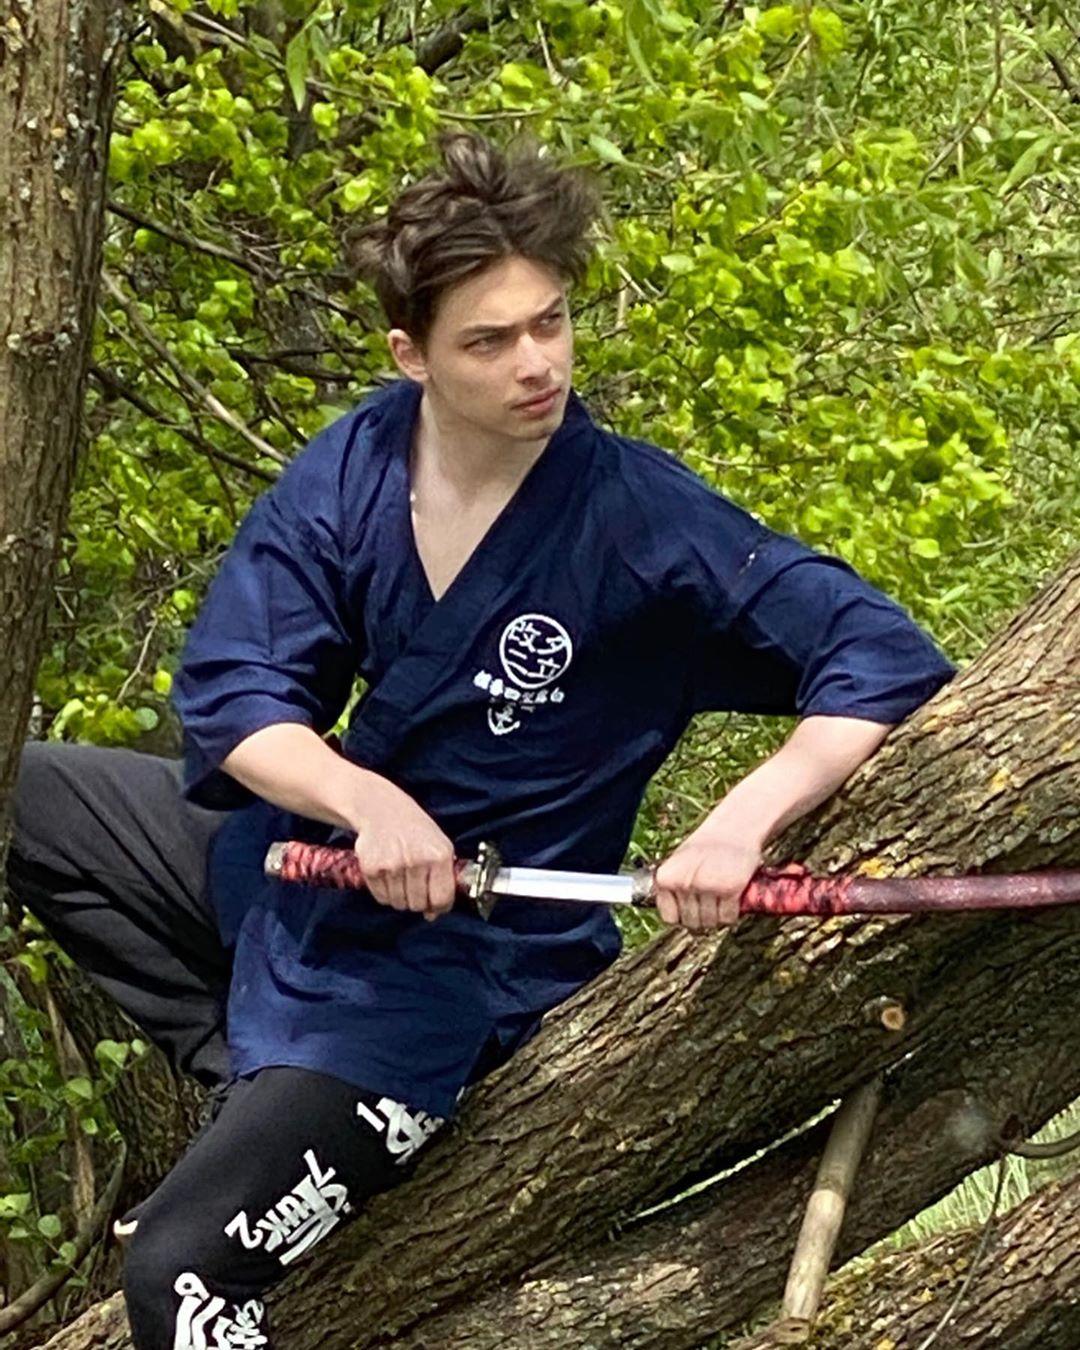 Архип Глушко позирует с мечами